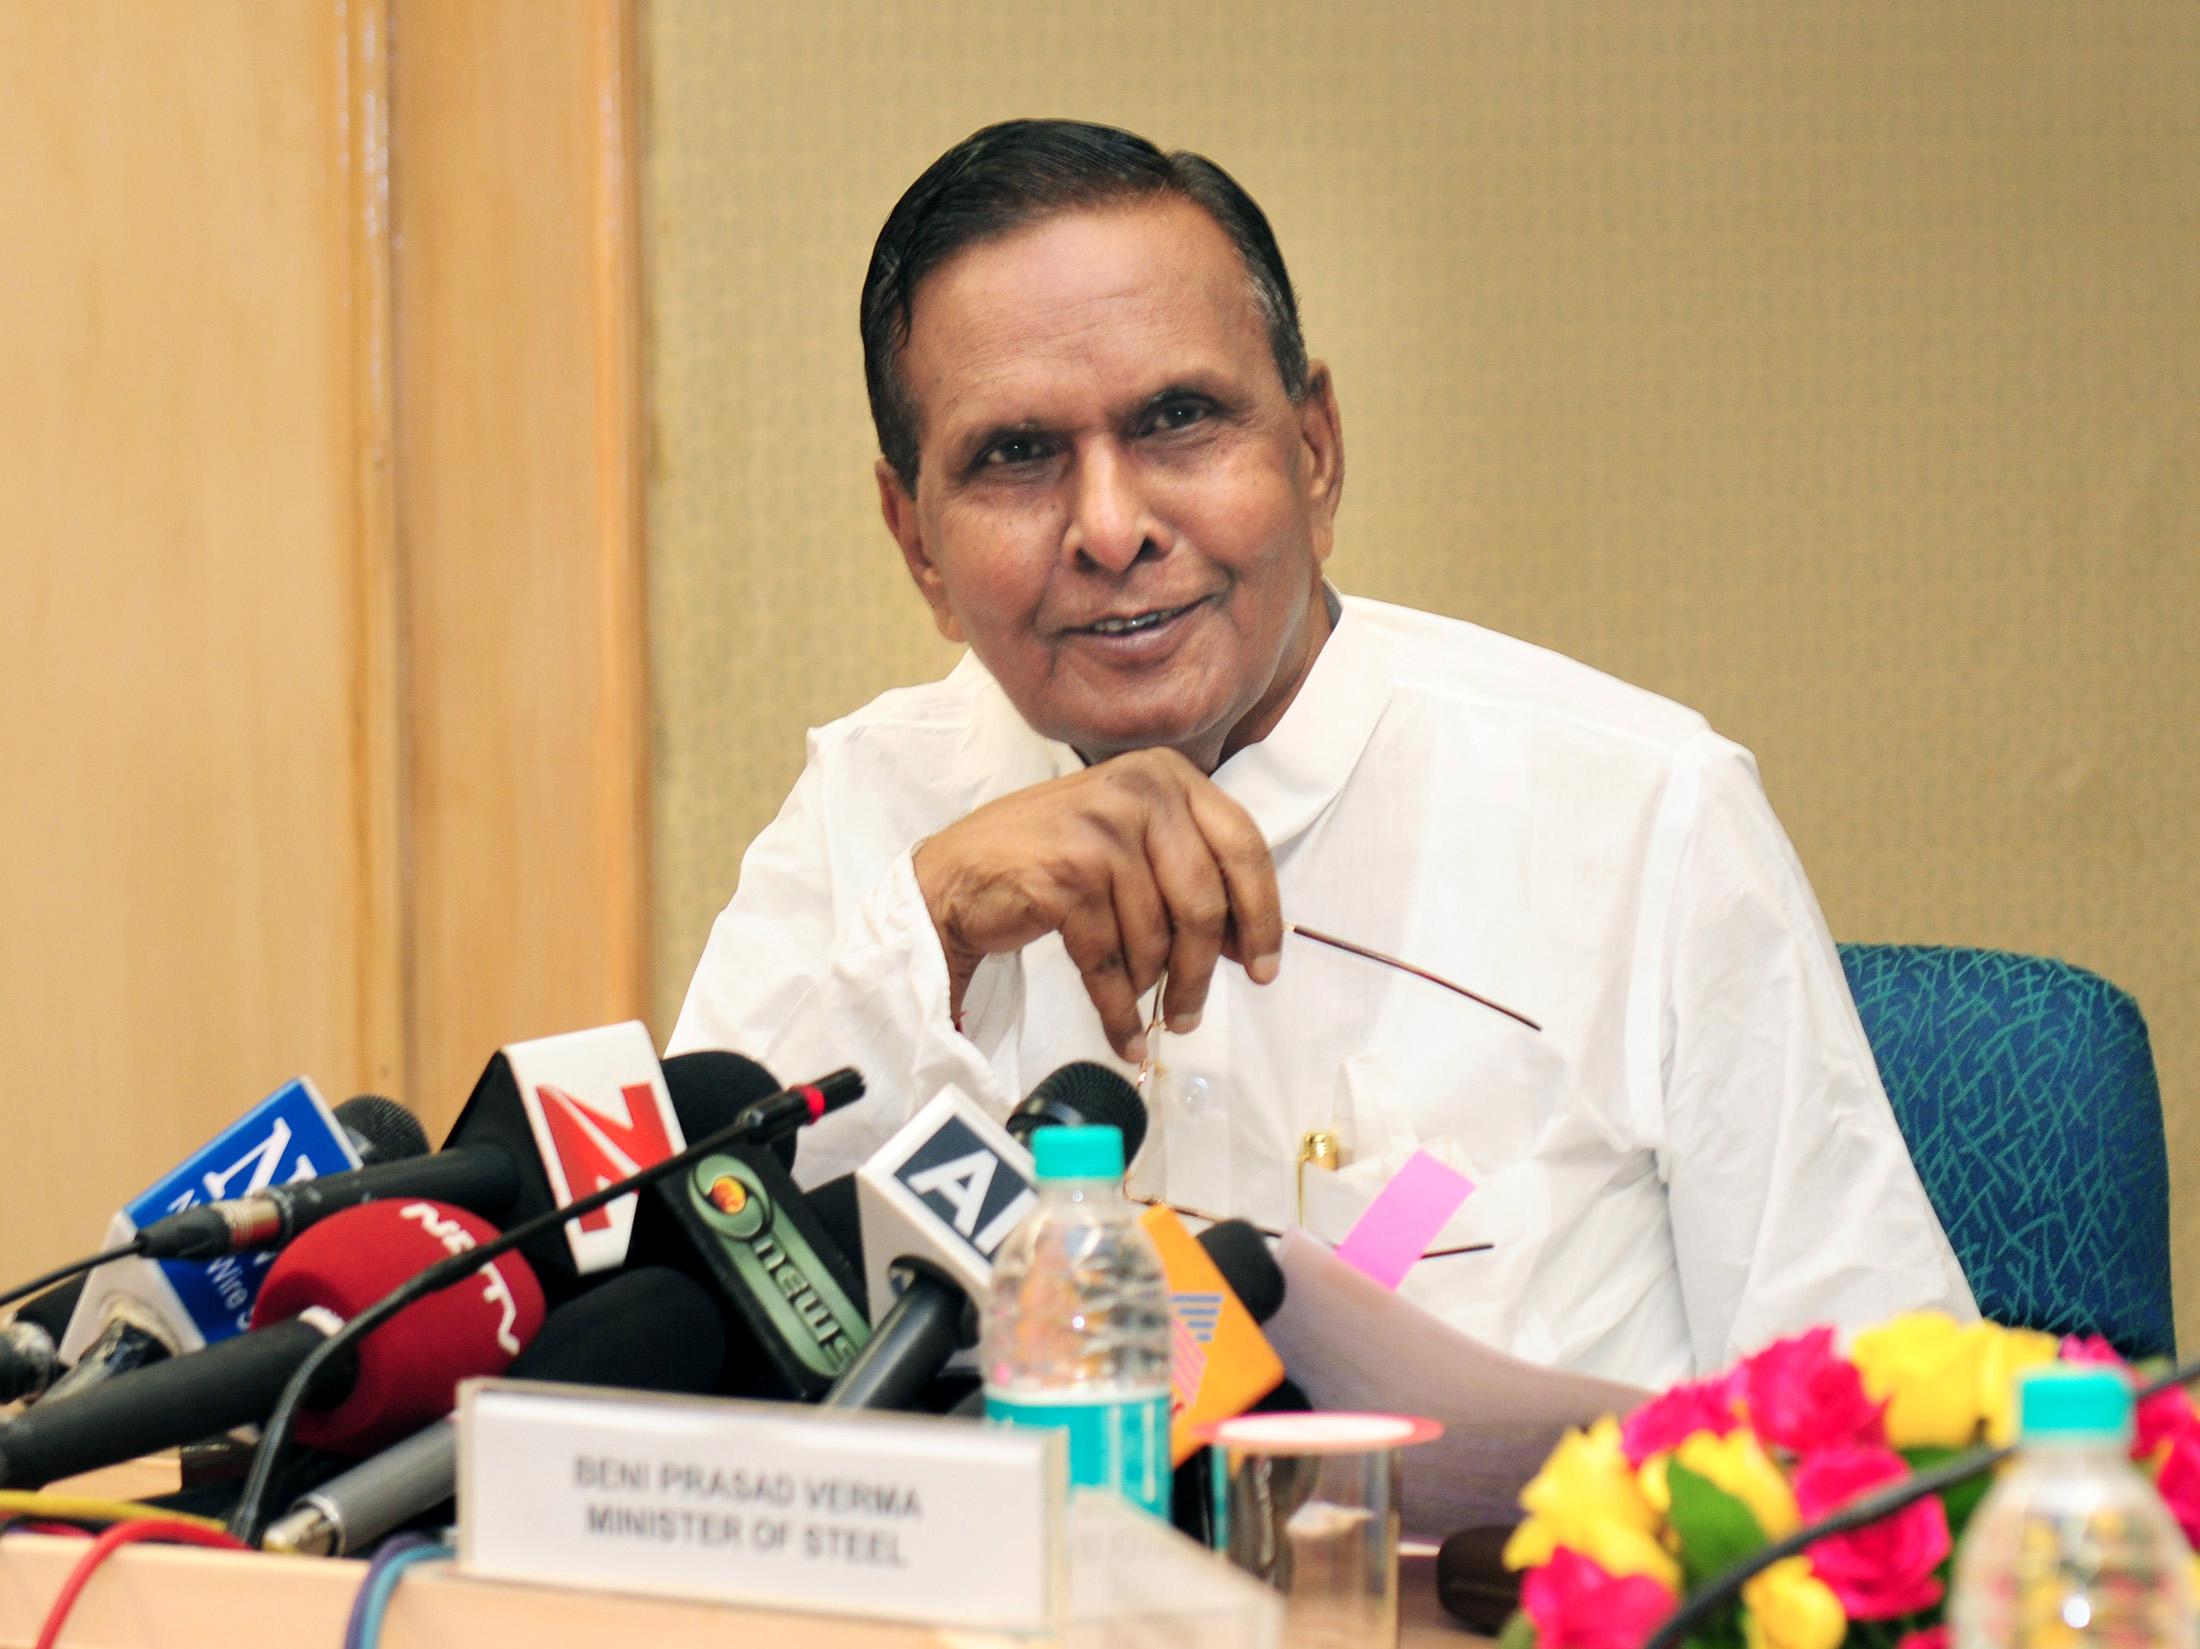 Beni Prasad Verma, Former Union Minister And Samajwadi Party Leader, Dies At 79